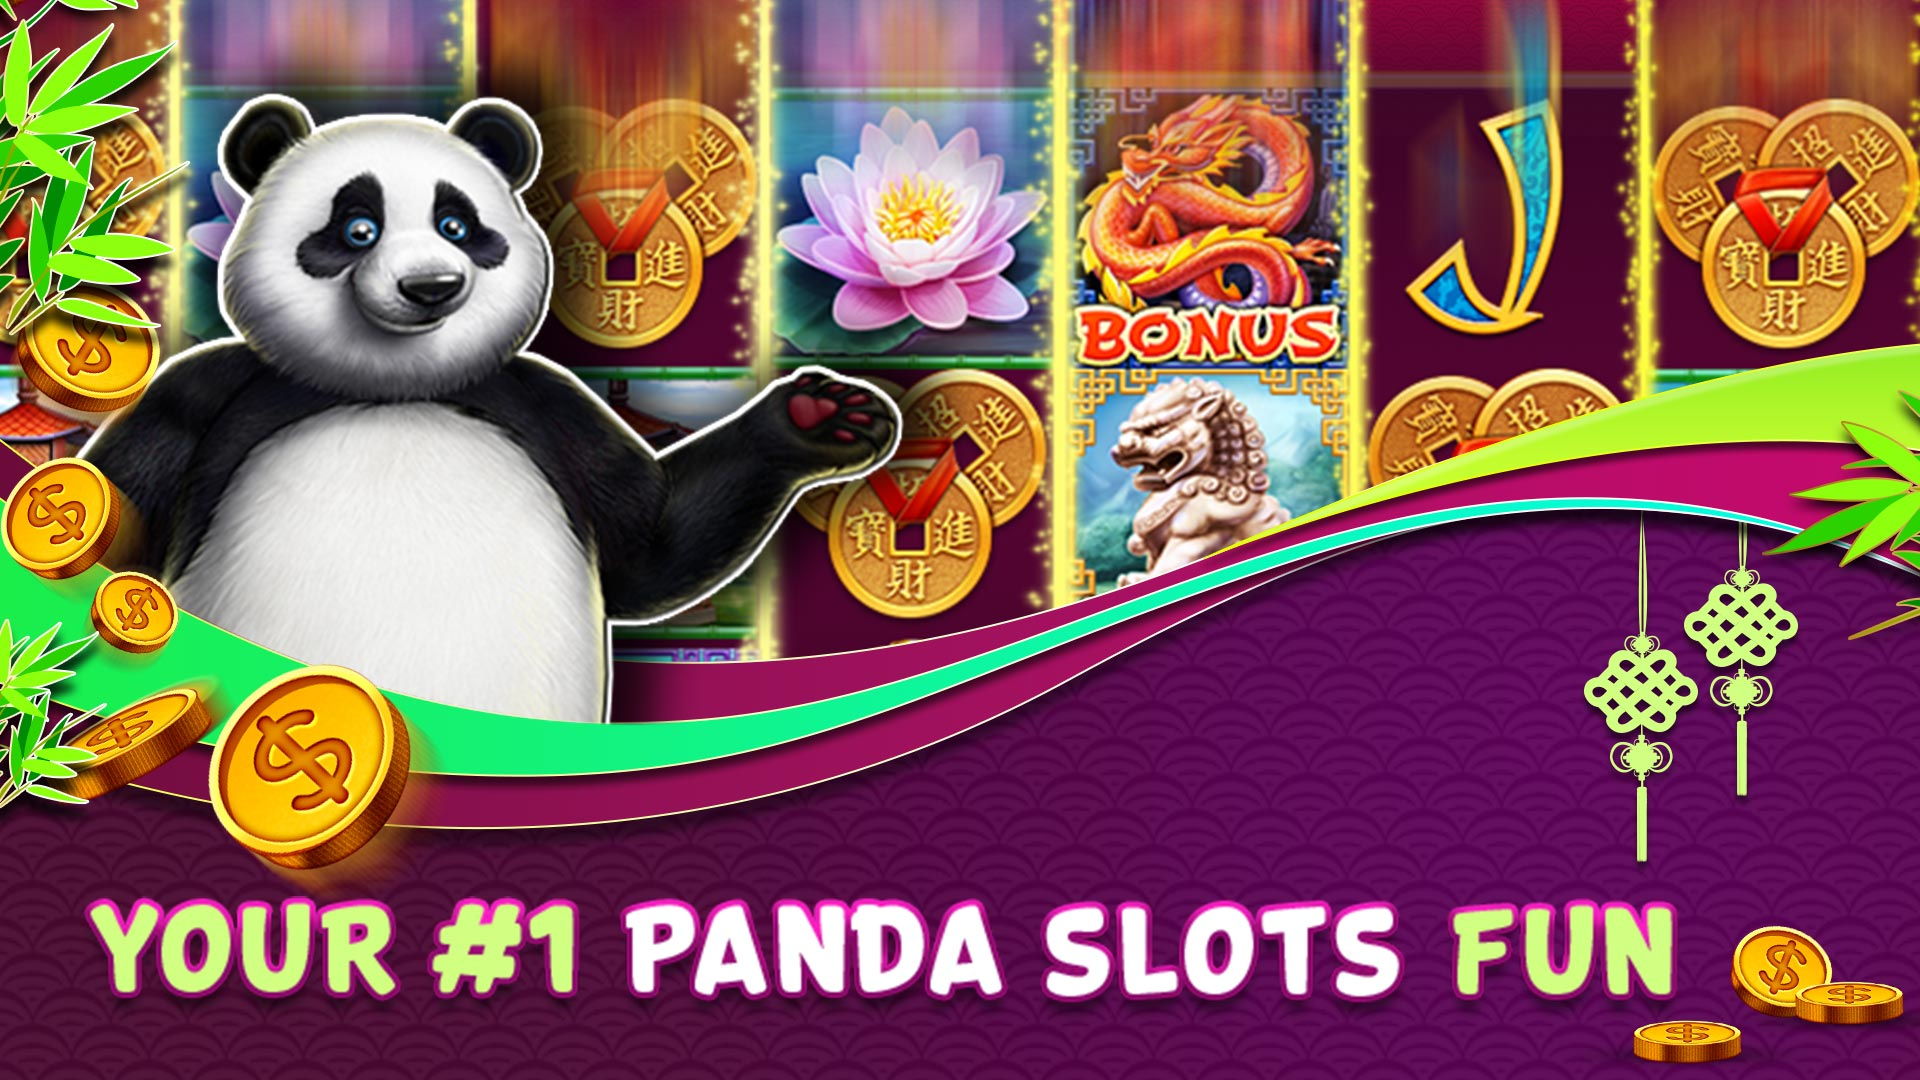 La machine à sous gratuite Panda Panda